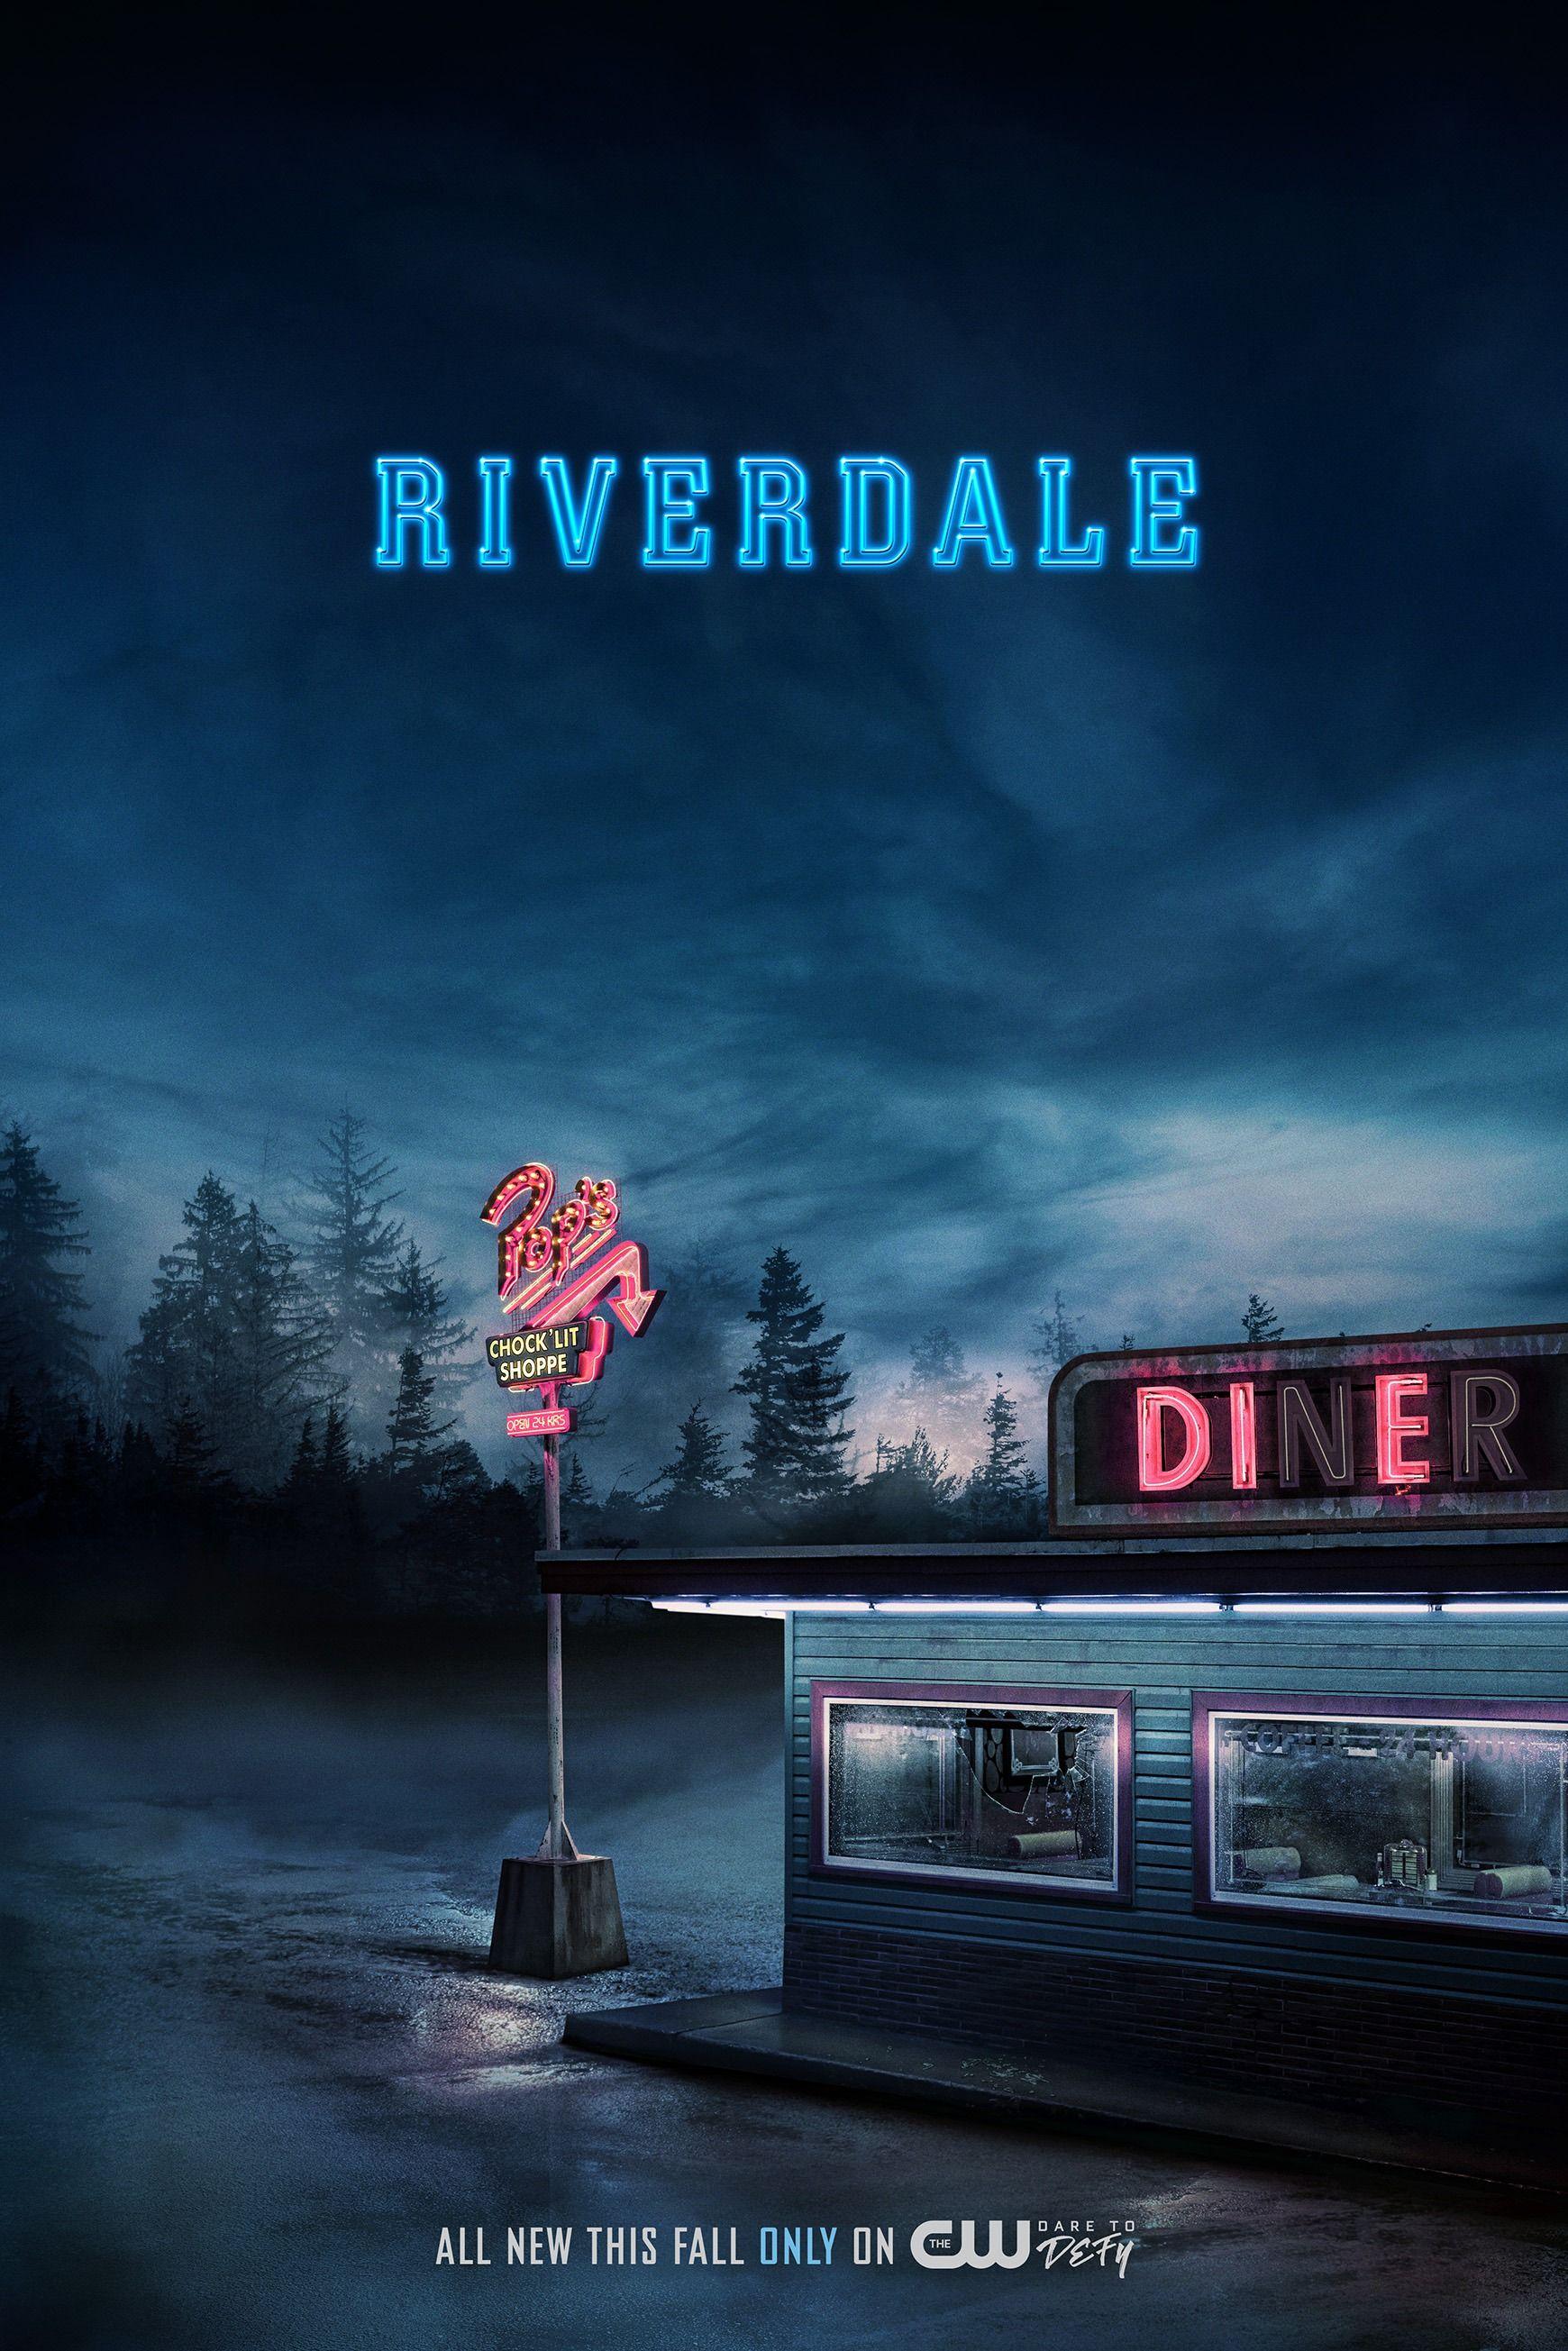 Riverdale Плакат, Вдохновляющие картинки, Обои